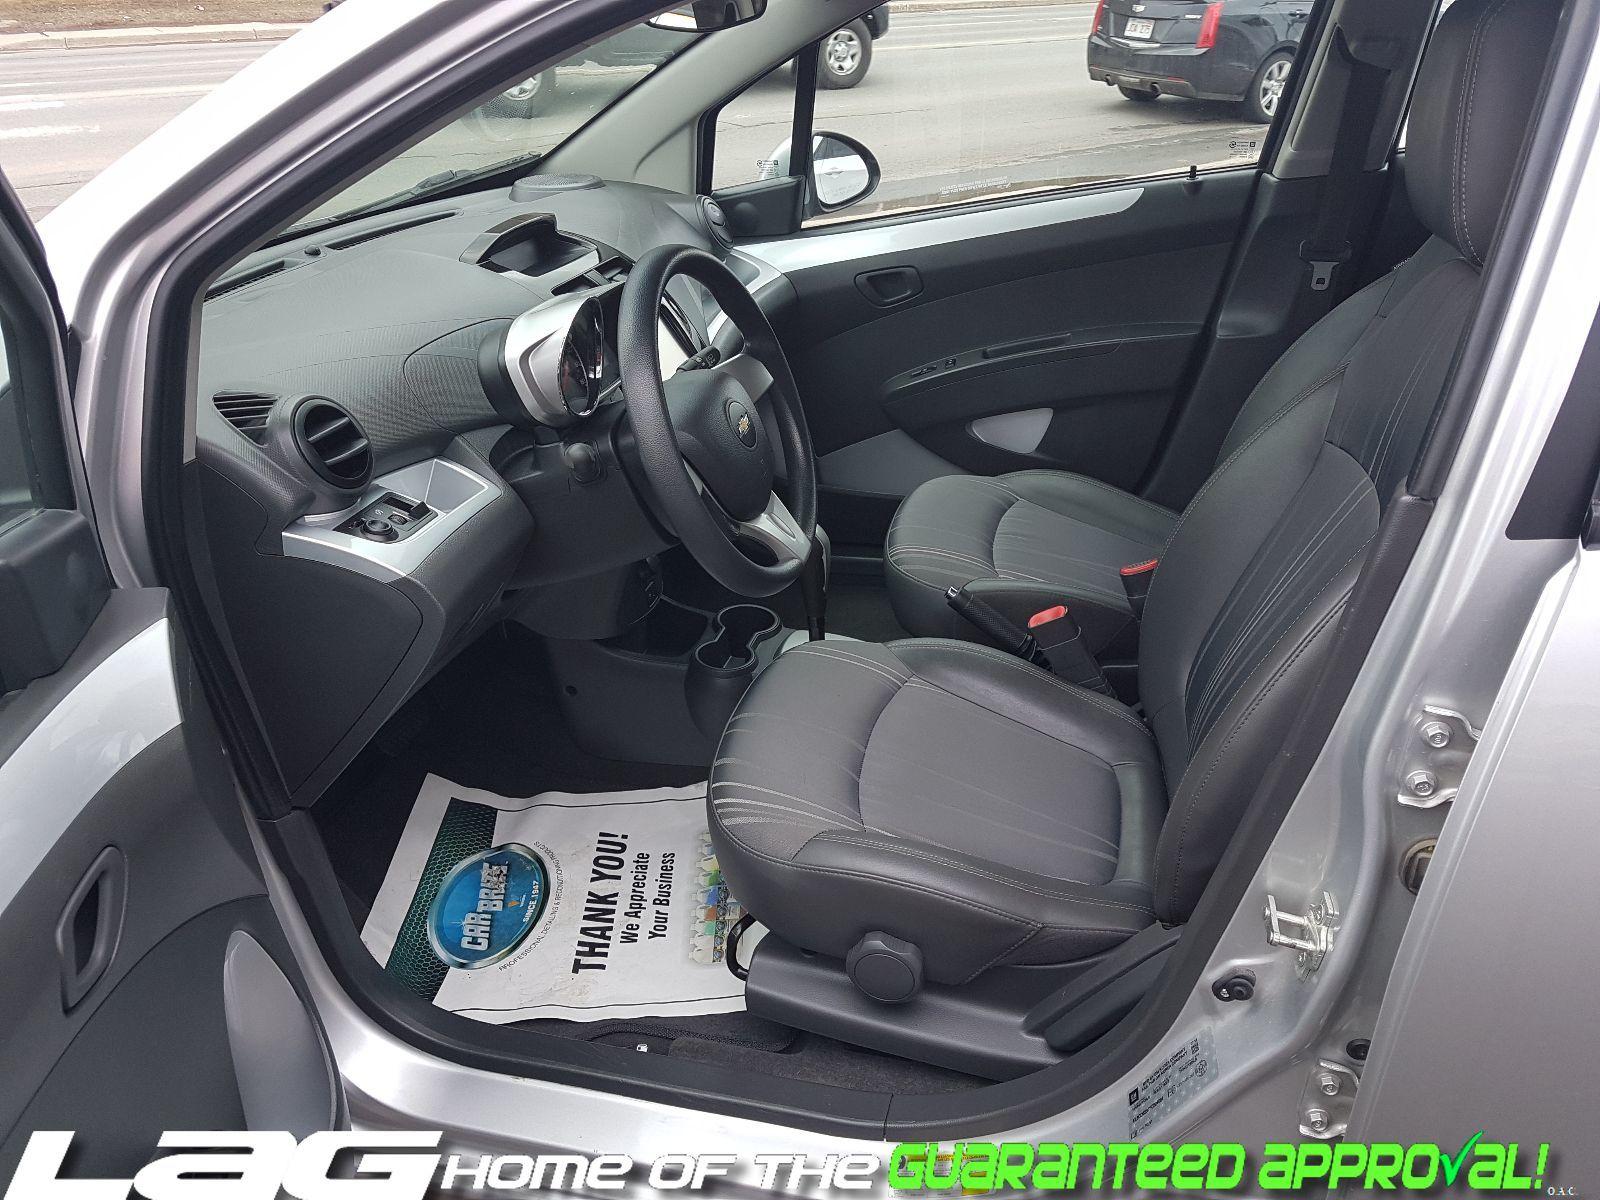 apr us chevrolet news content sparkev media detail en ev to spark repriced pages greater offer vehicles value